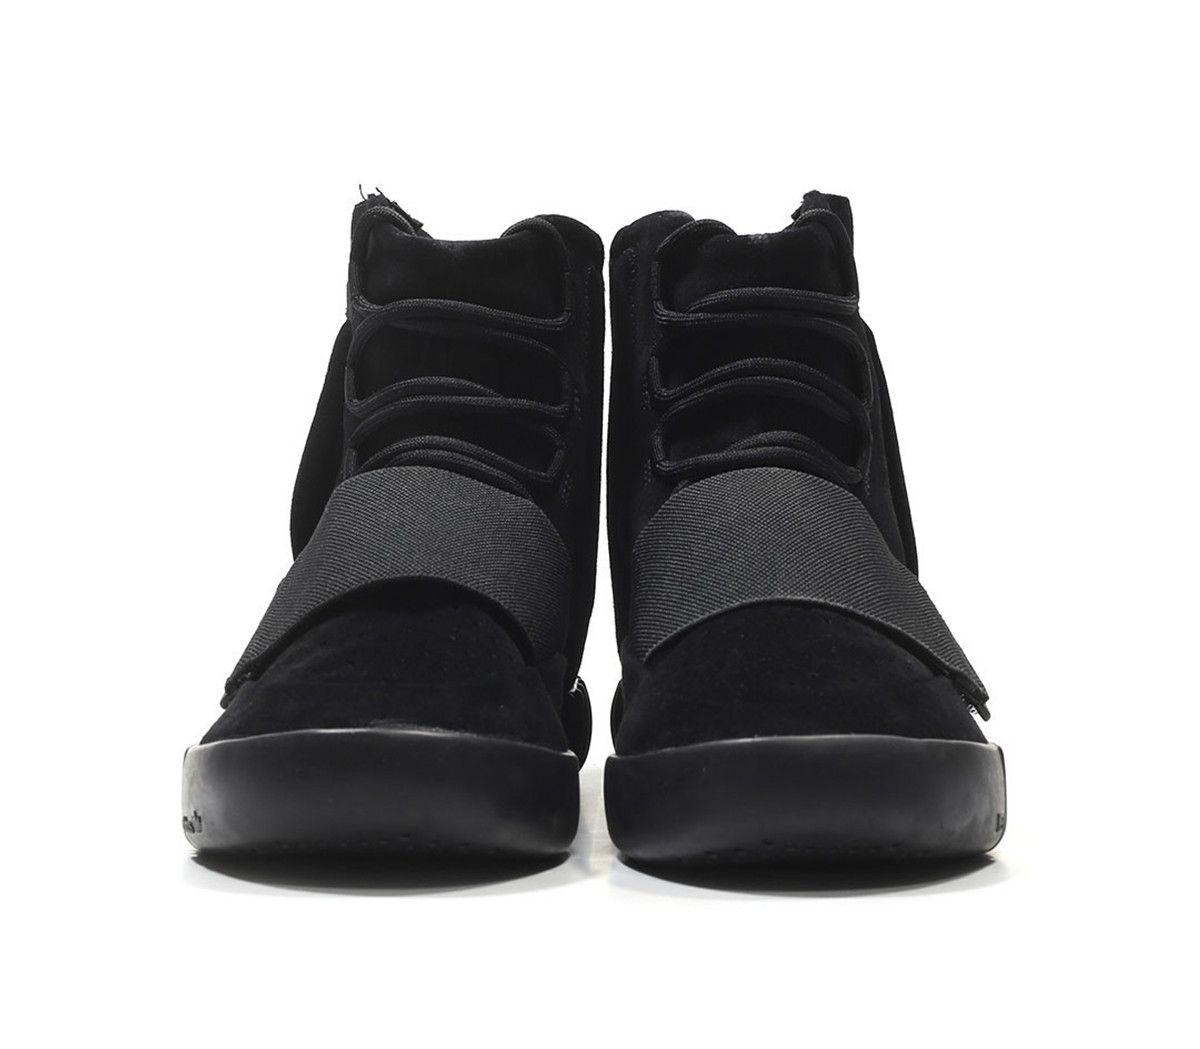 кроссовки Adidas Yeezy 750 Boost By Kanye West Triple Black